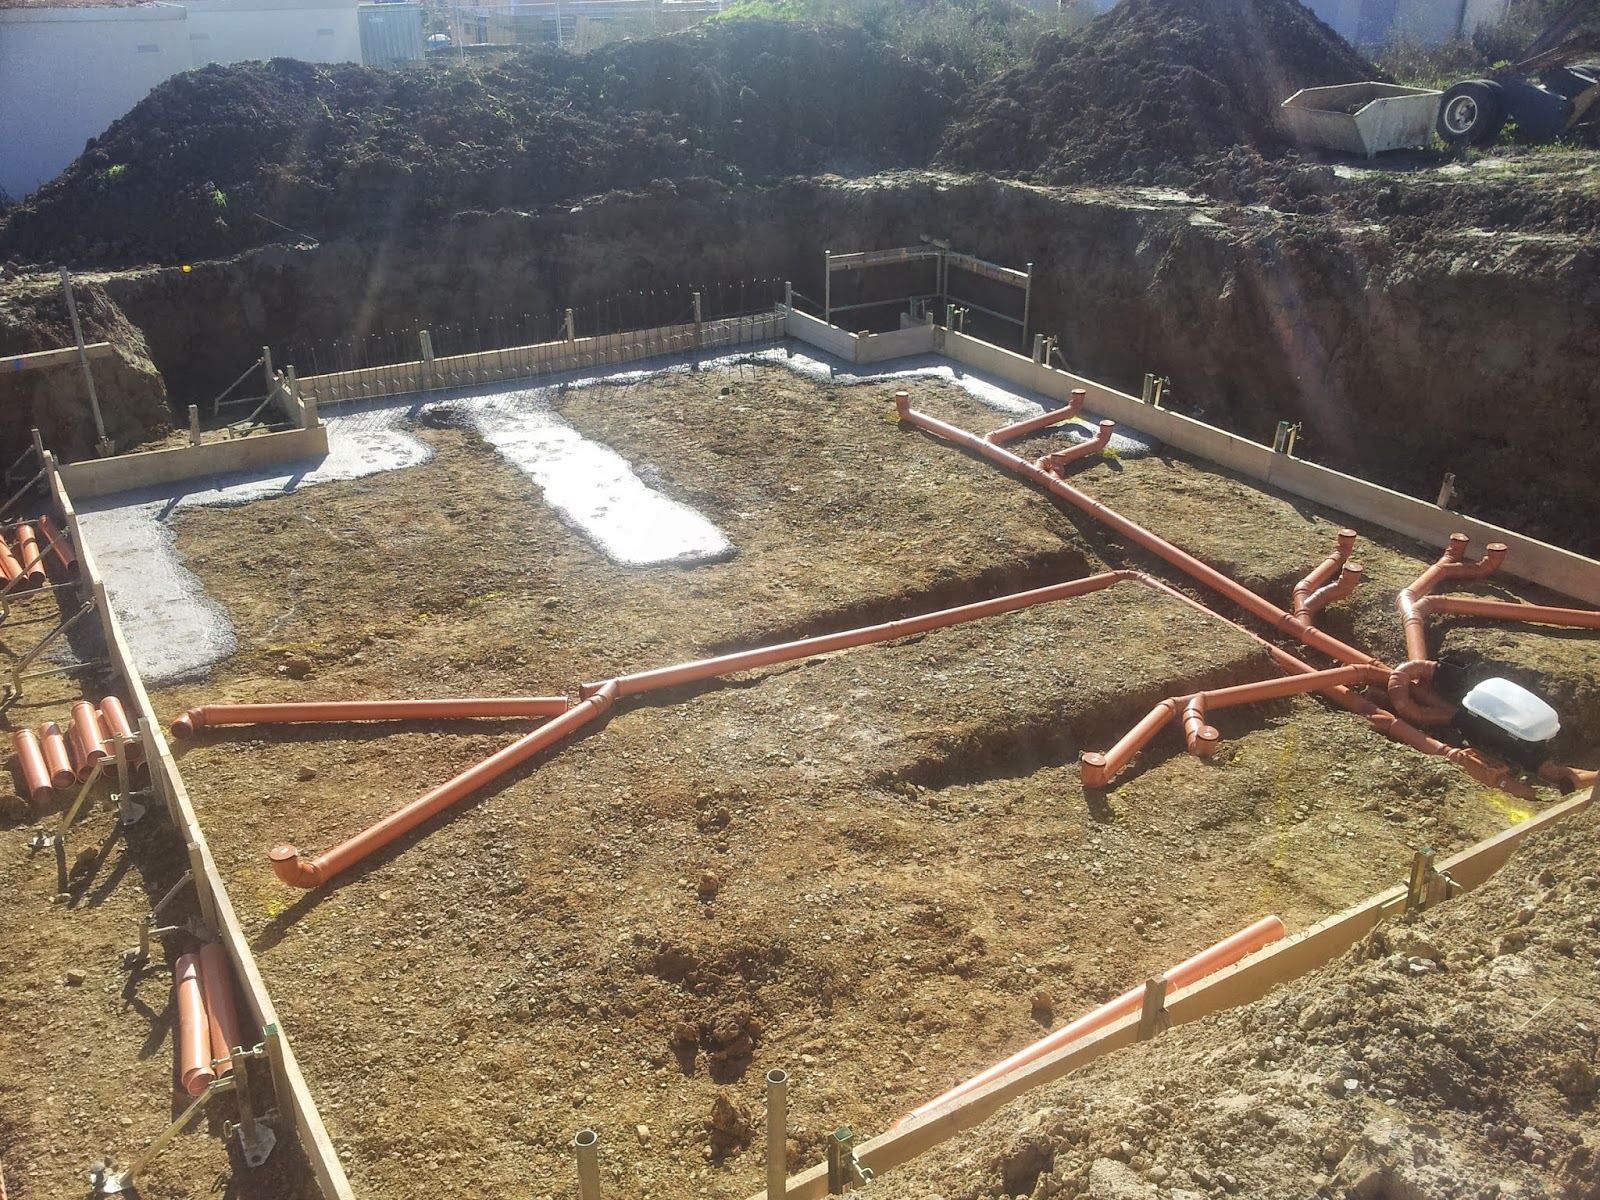 drainagerohr verlegen anleitung drainagerohr verlegen eine schritt f r schritt anleitung. Black Bedroom Furniture Sets. Home Design Ideas